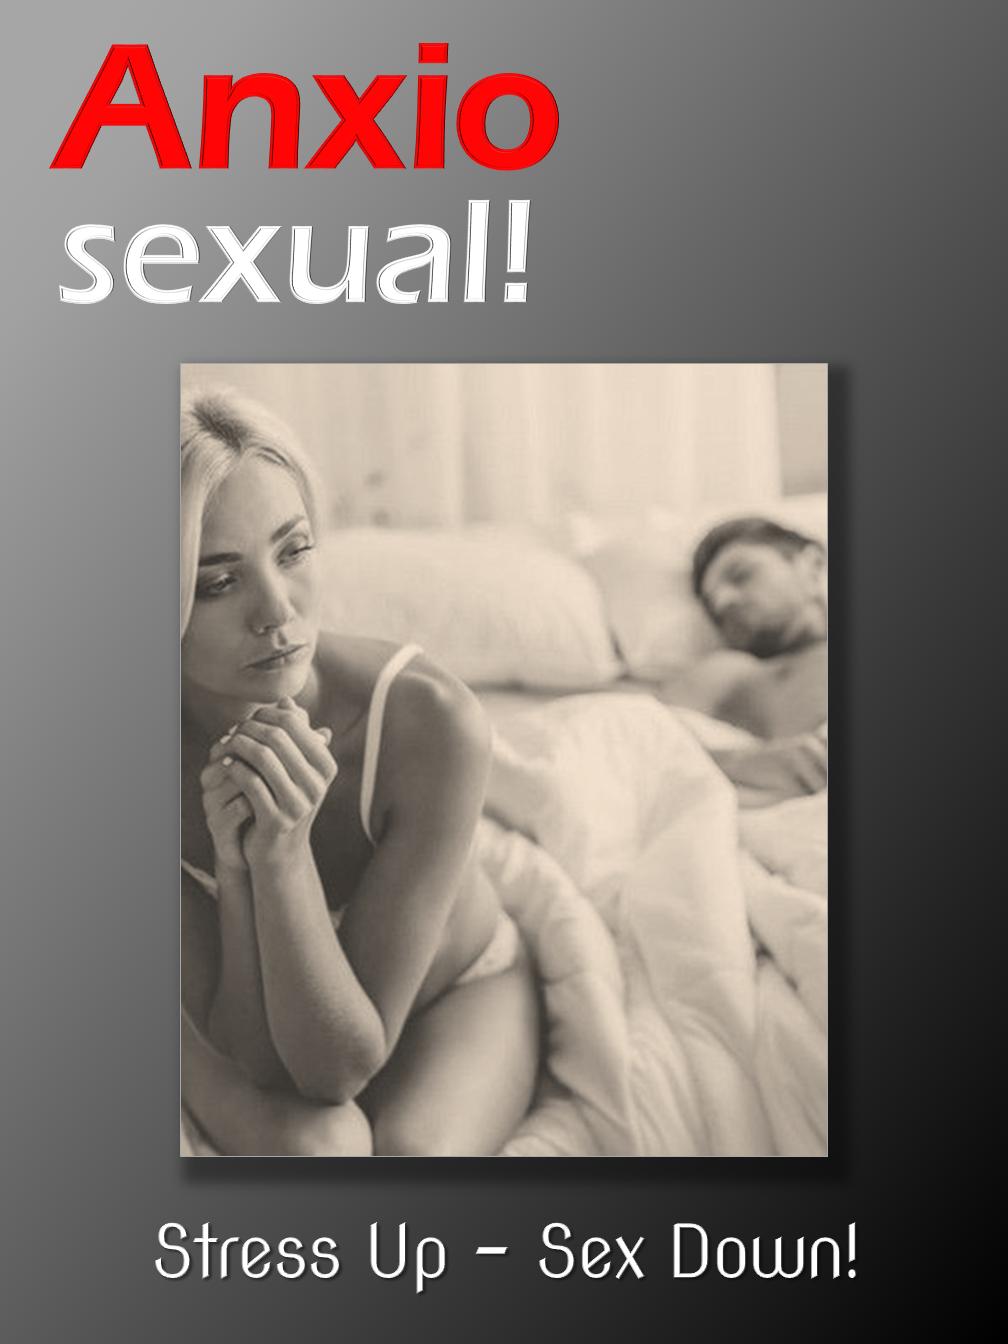 Anxio-sexual